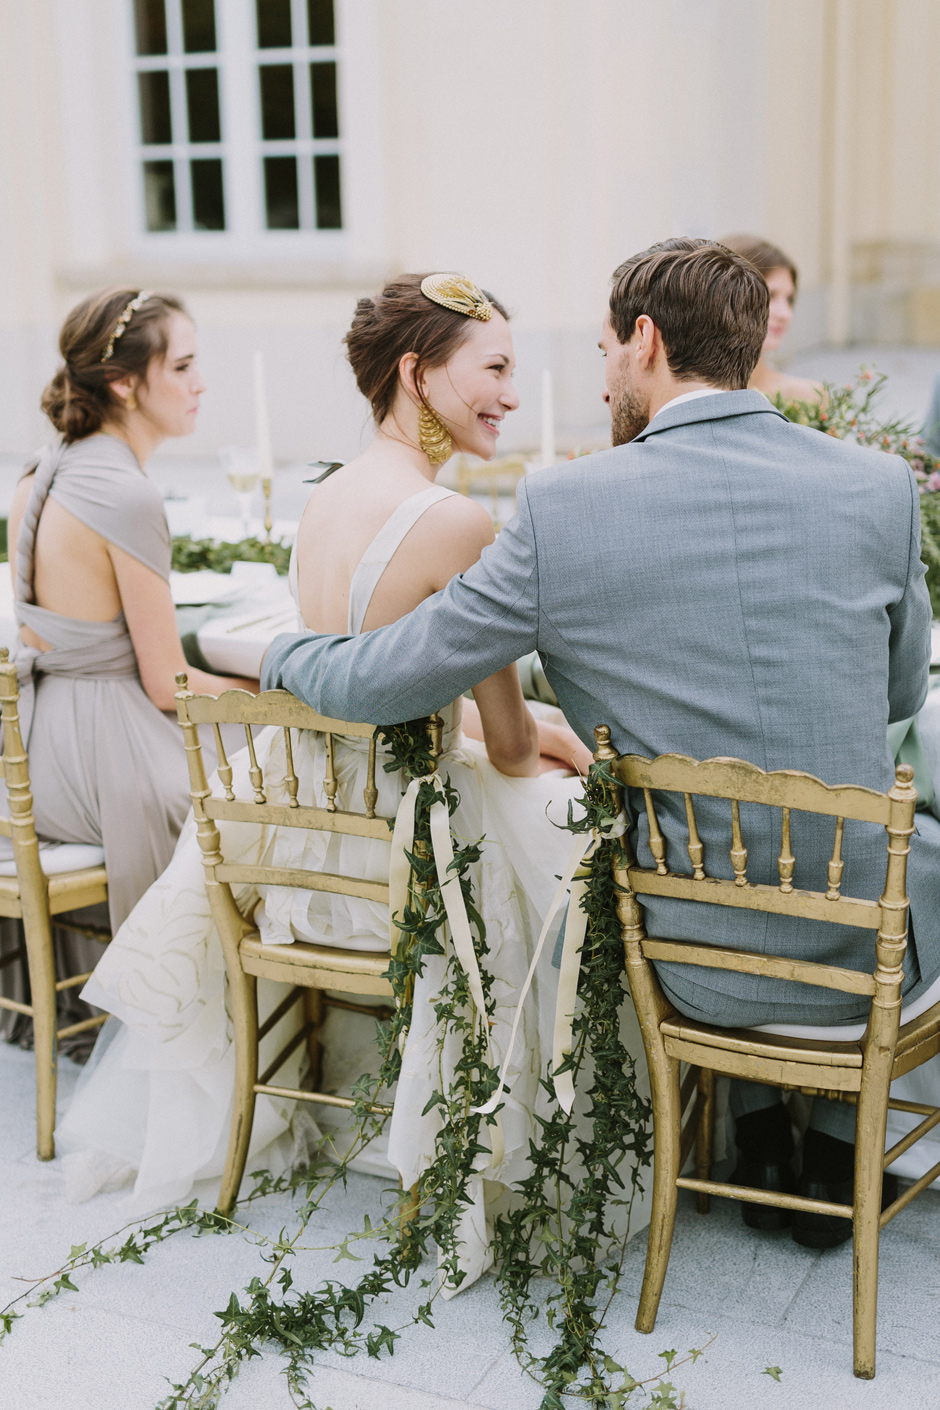 laxenburg-wedding-photographer-007